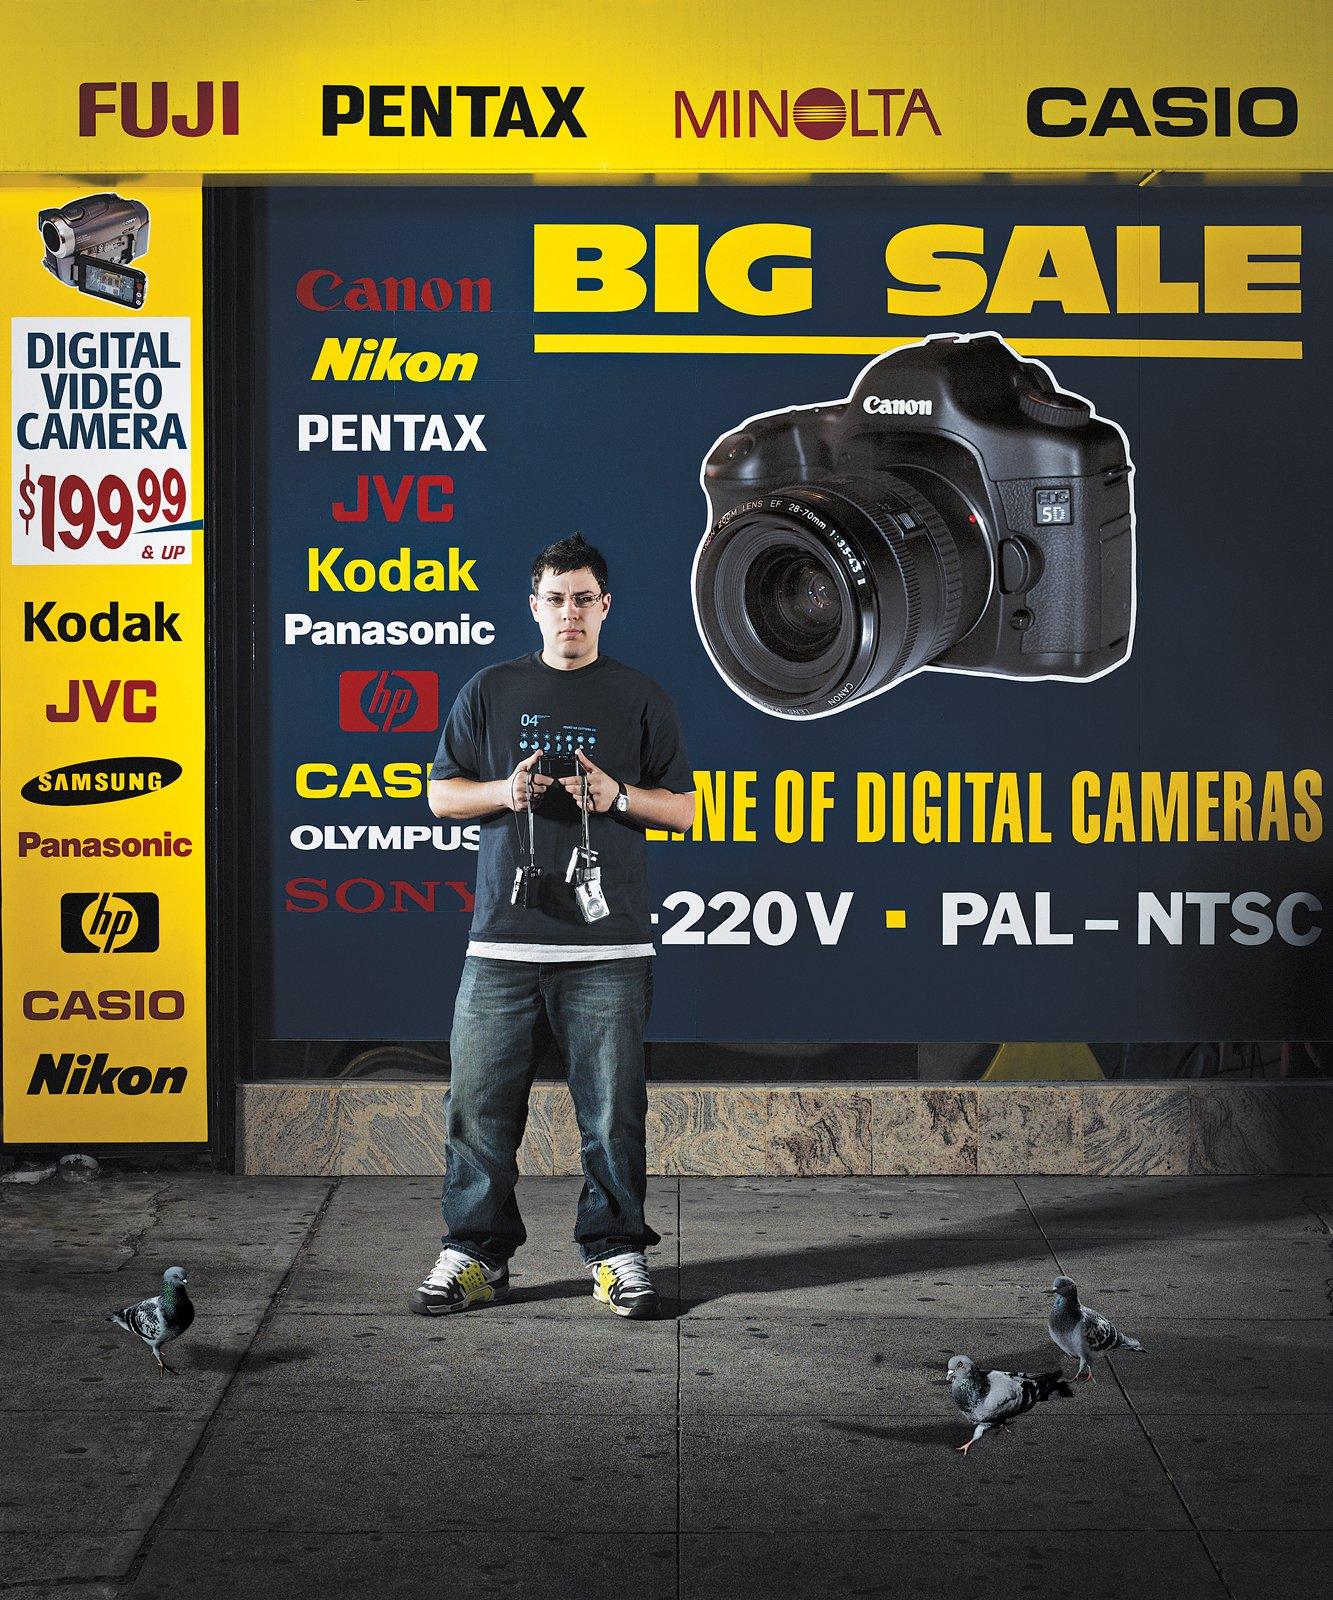 Dwell_Camera_Review 030  Photo 1 of 1 in Photographer Steve Reczkowski Reviews 5 Digital Cameras